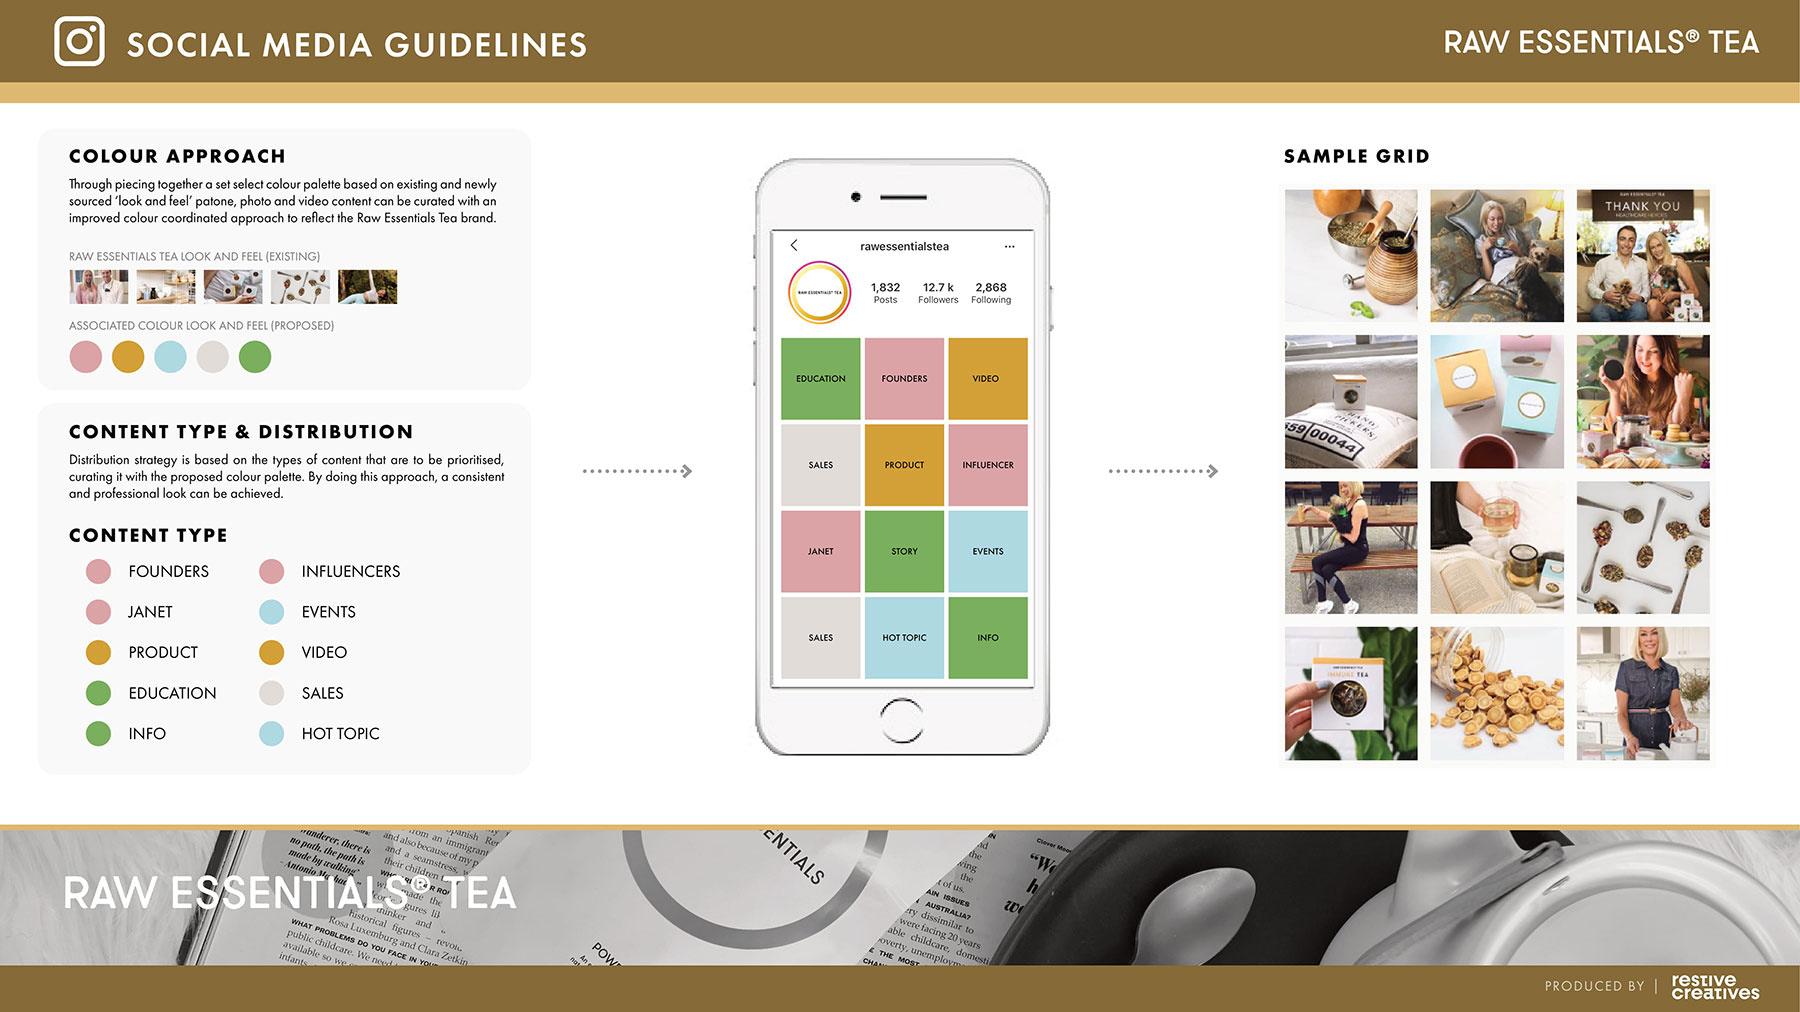 Raw Essentials Tea Janet Roach